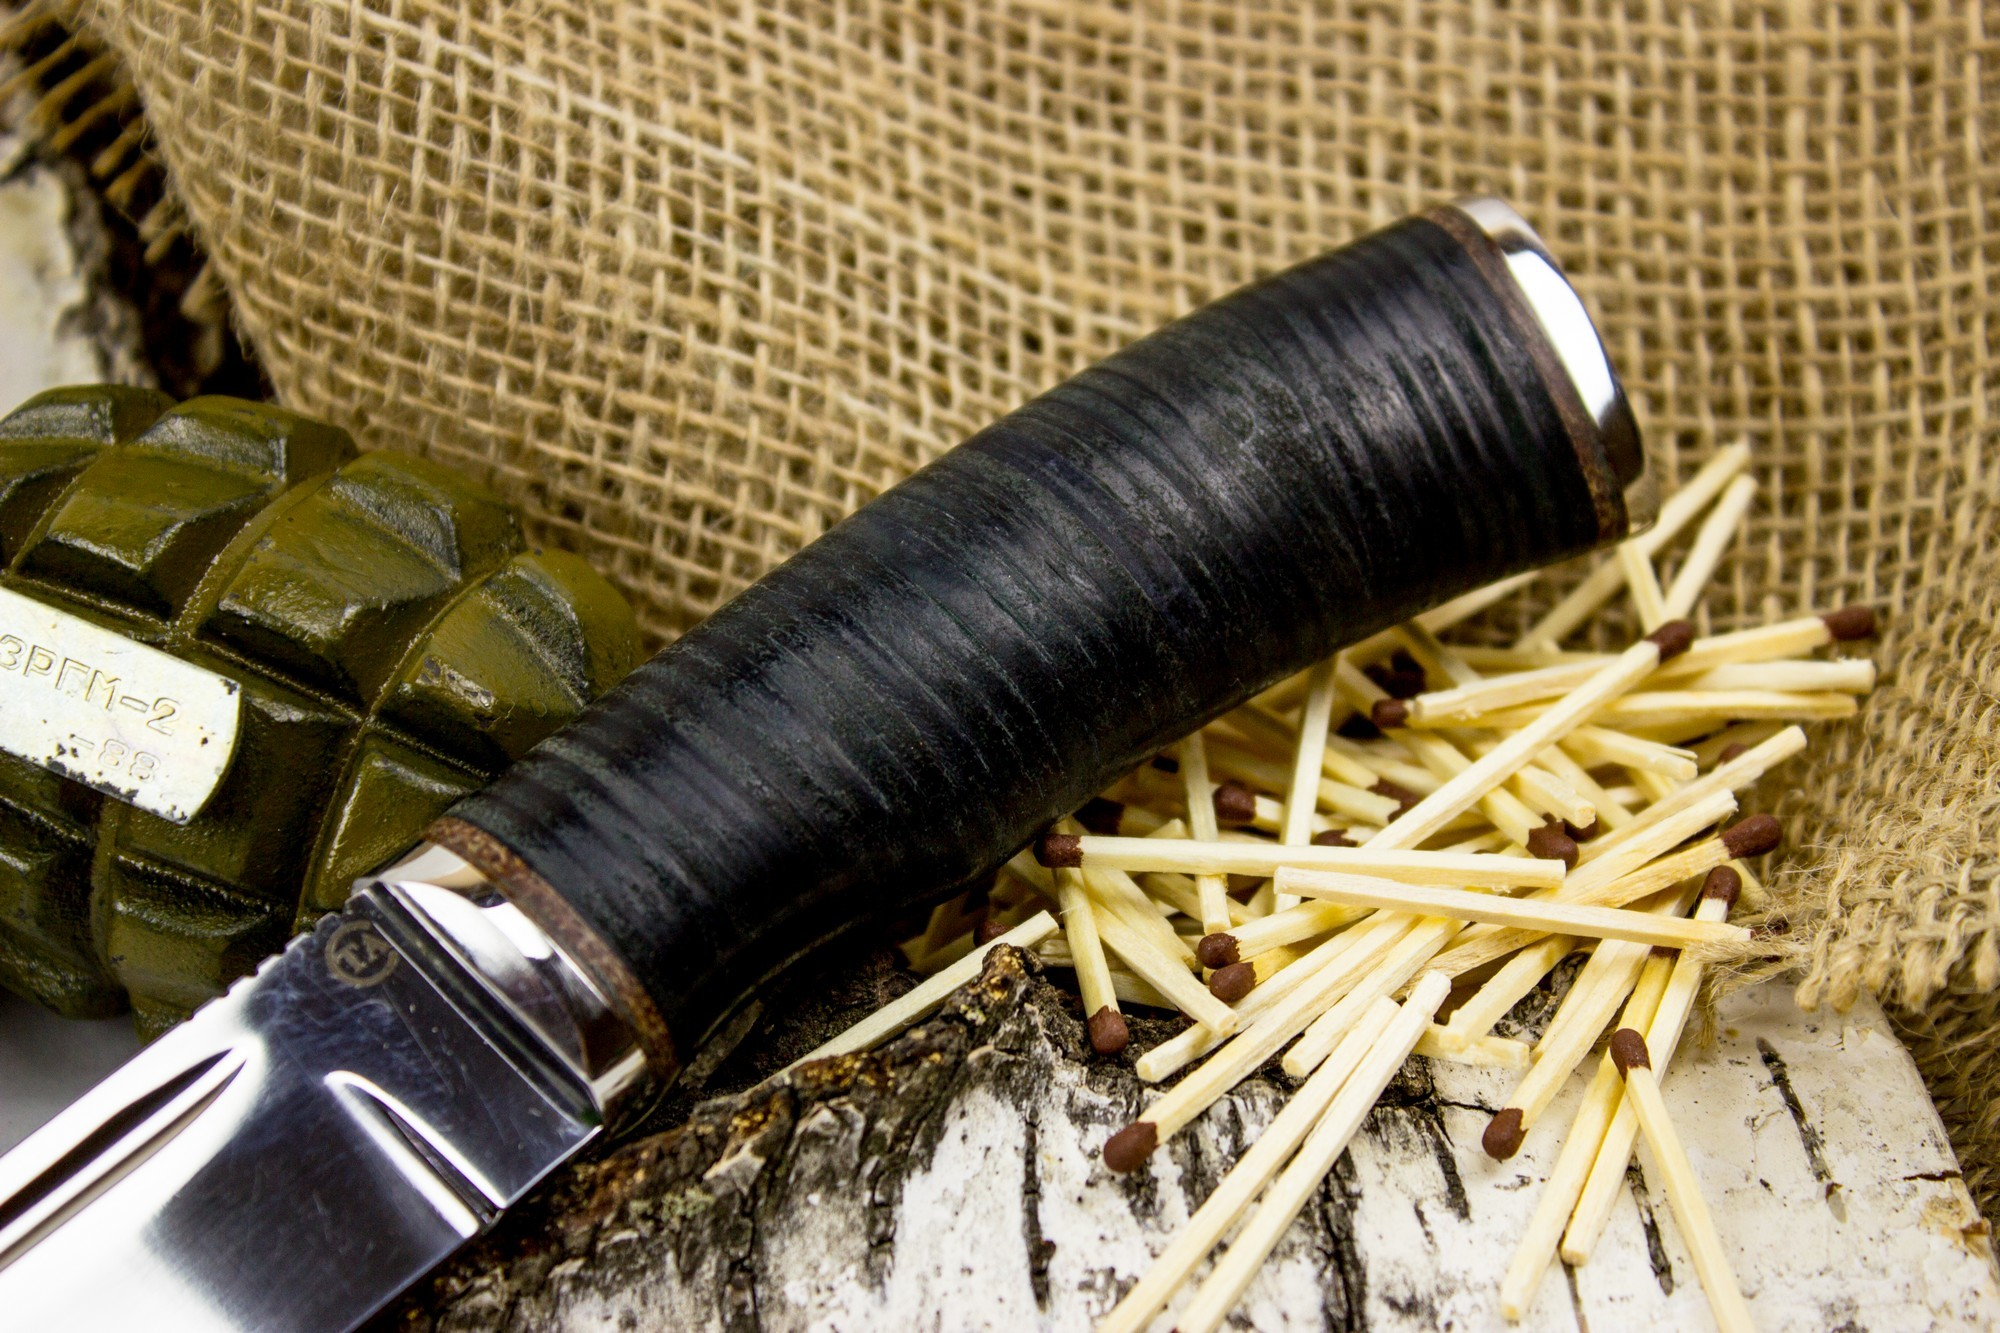 Фото 6 - Нож Русич, сталь 95х18, кожа от Титов и Солдатова